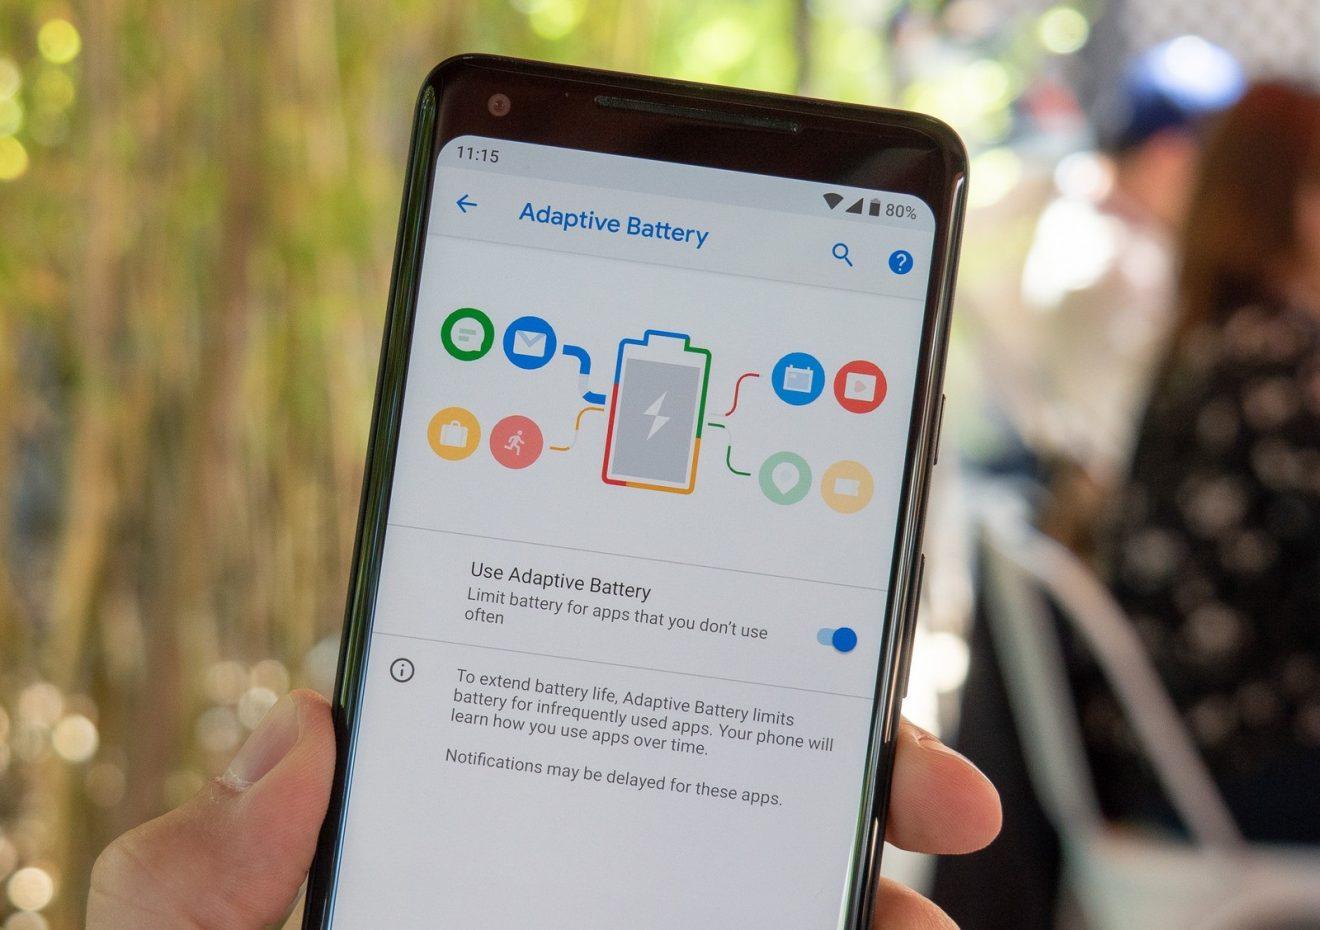 батарея android 9 pie